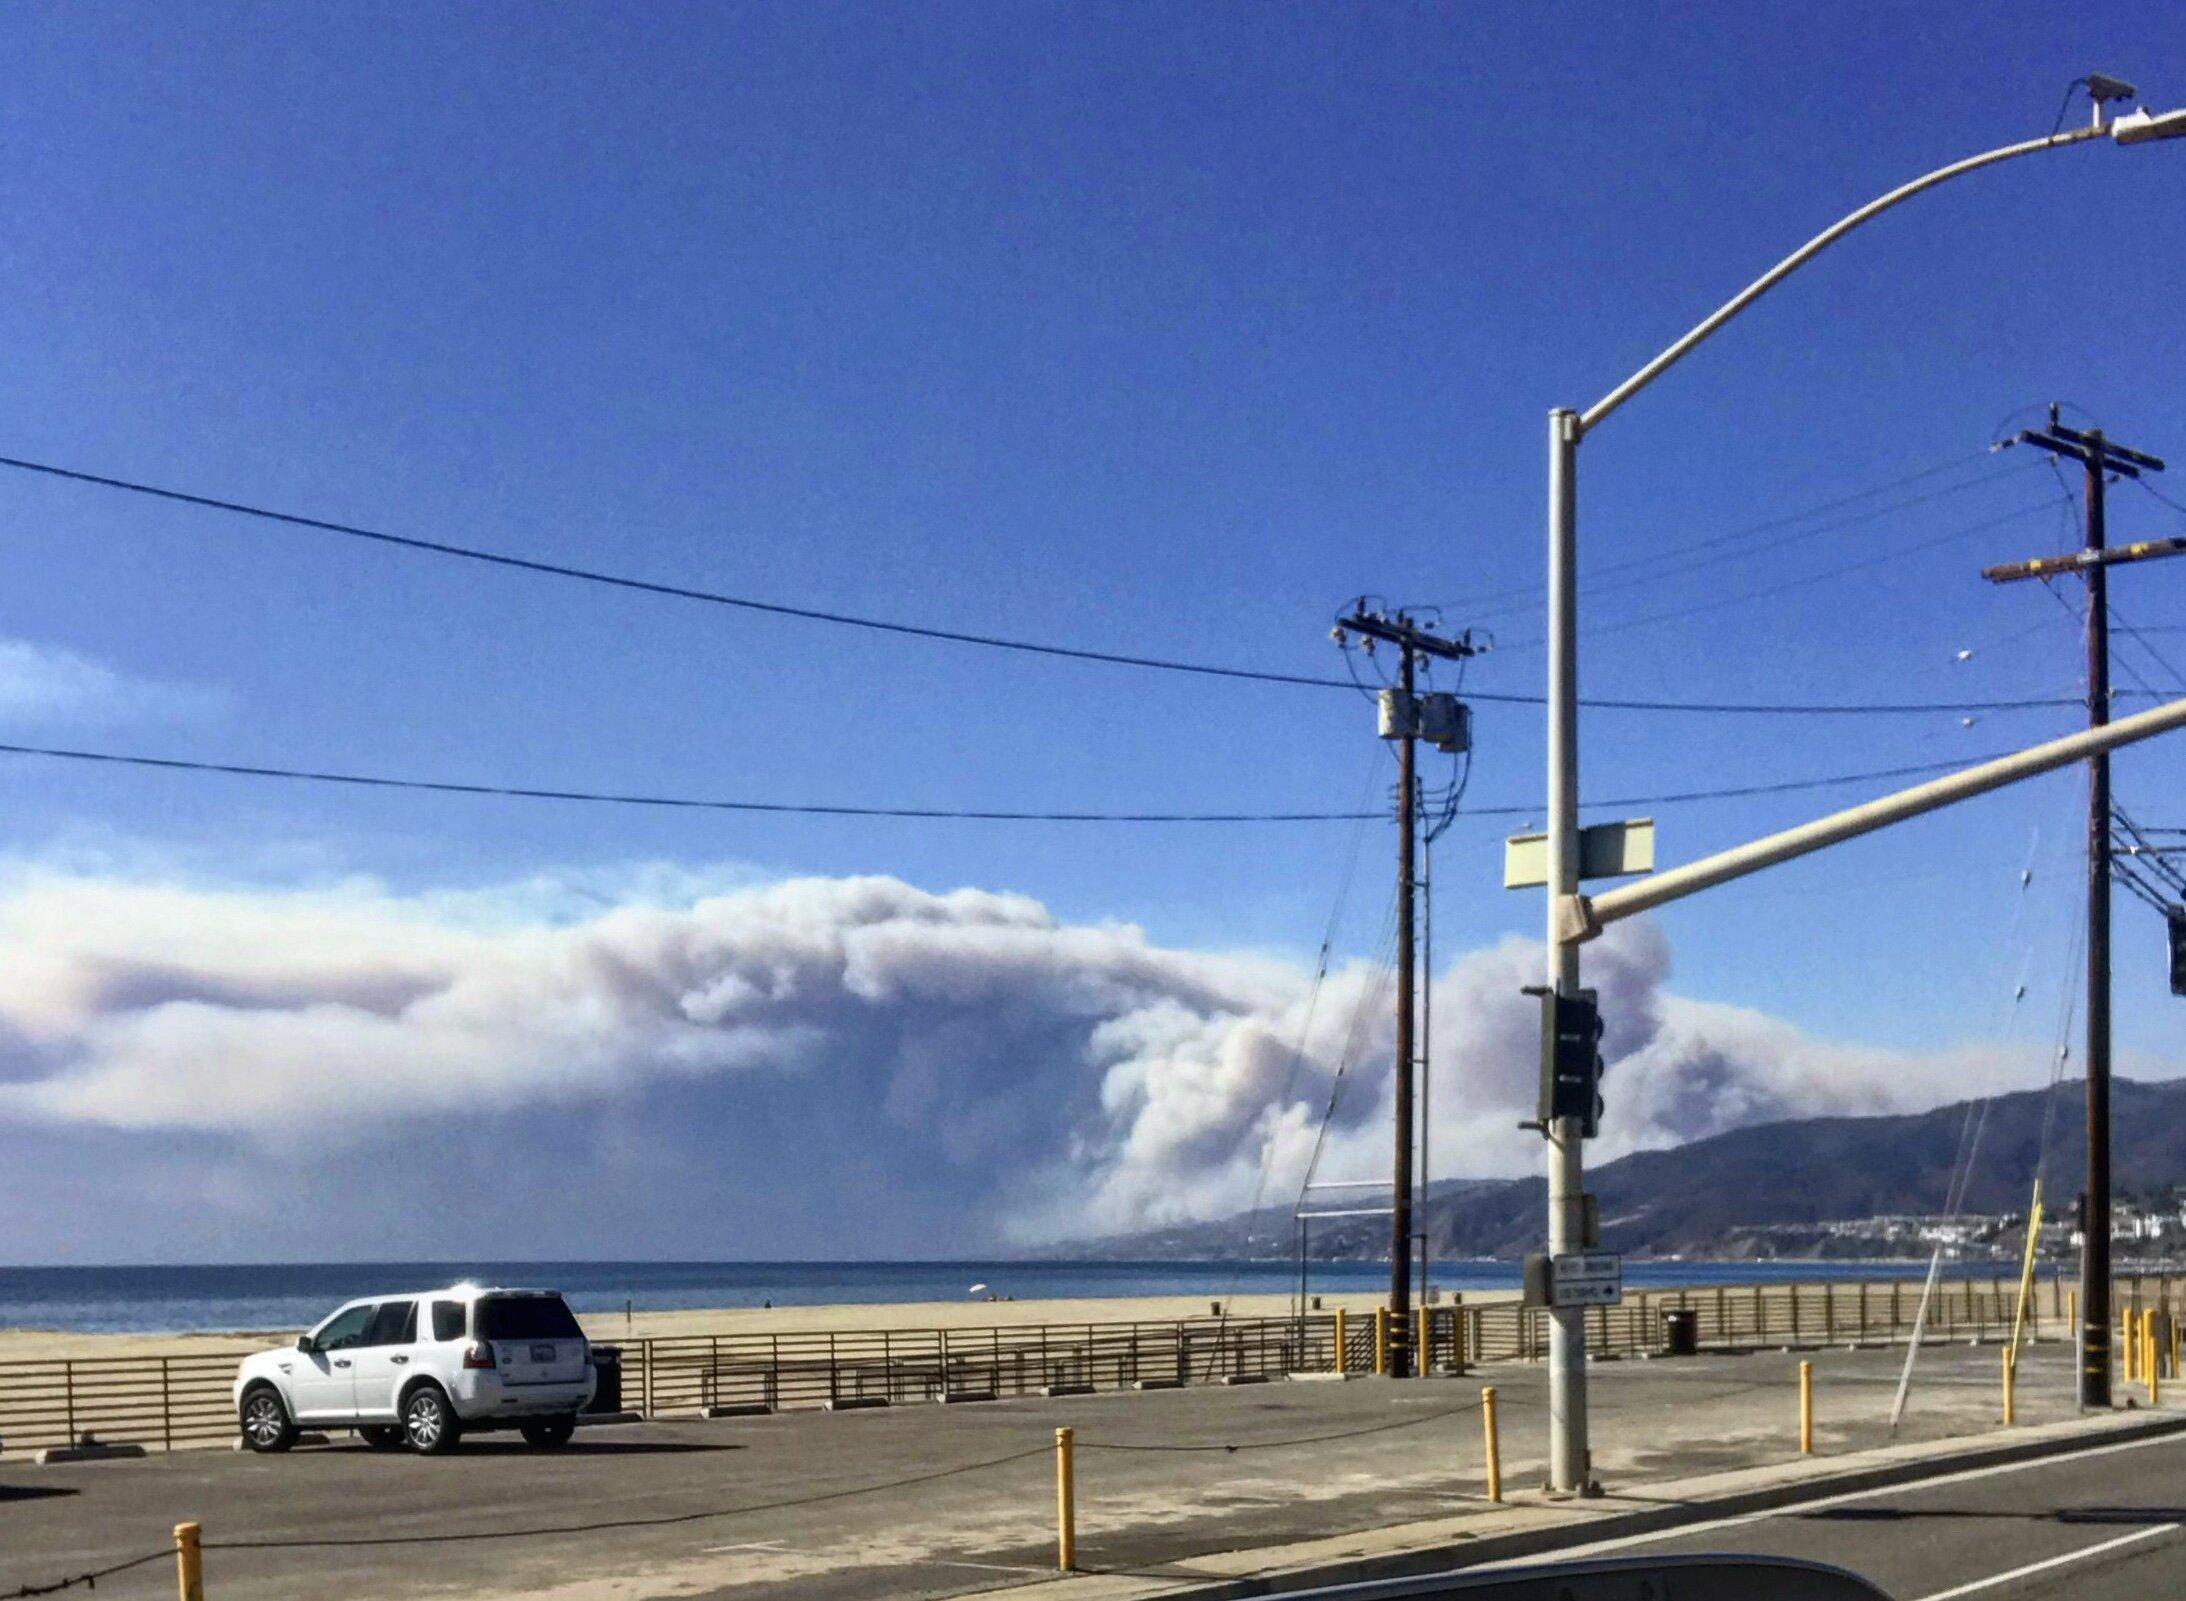 12:16pm - November 9, 2018 - The last photo I took of the smoke consuming Malibu from PCH in Santa Monica (📷: Lisa Butala Zabaldo)